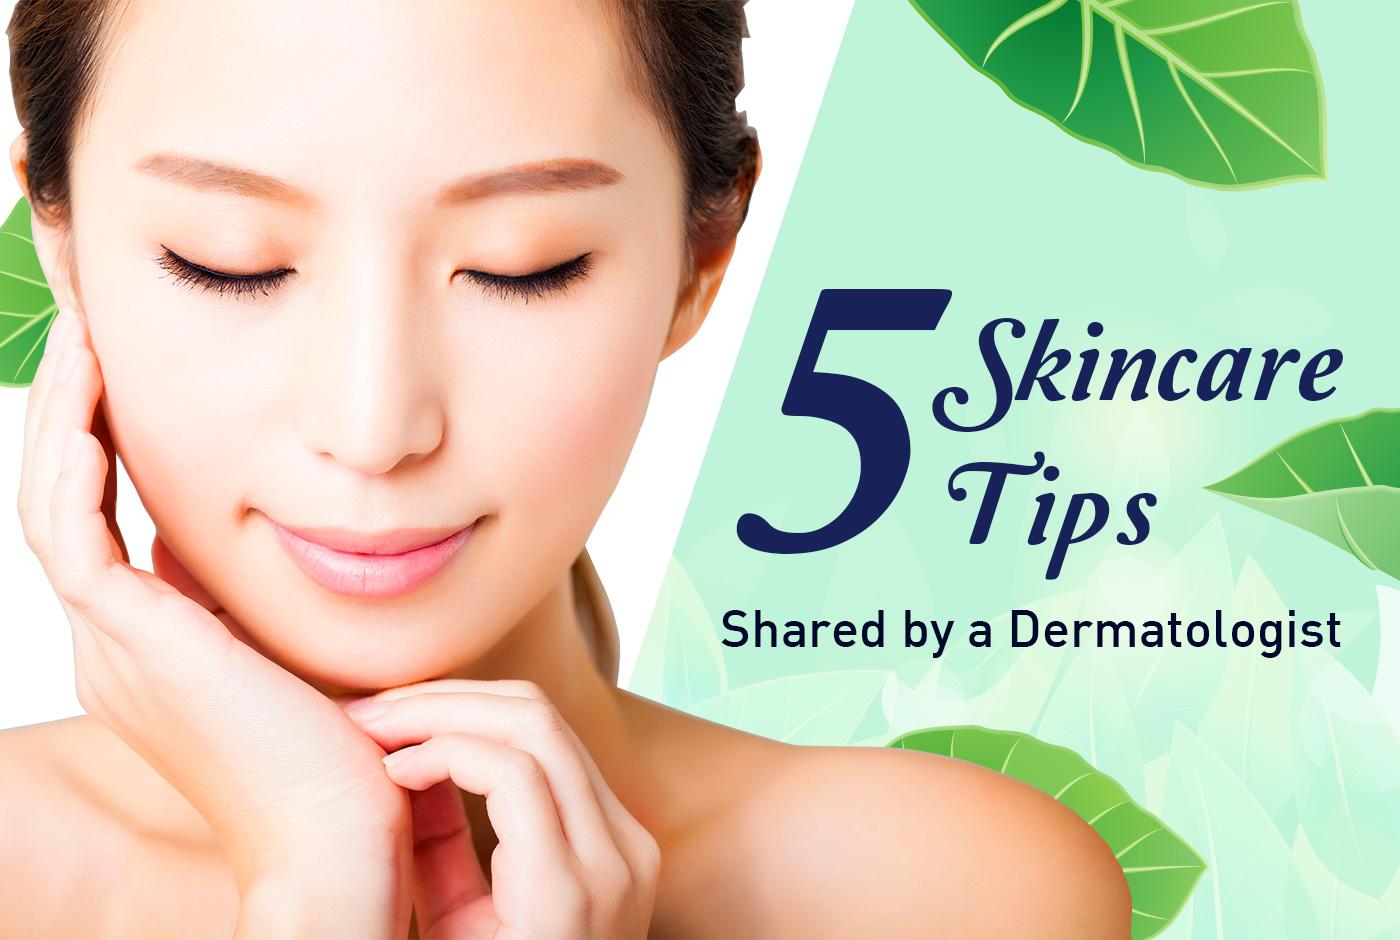 5 skincare tips, shareda dermatologist | | raffles